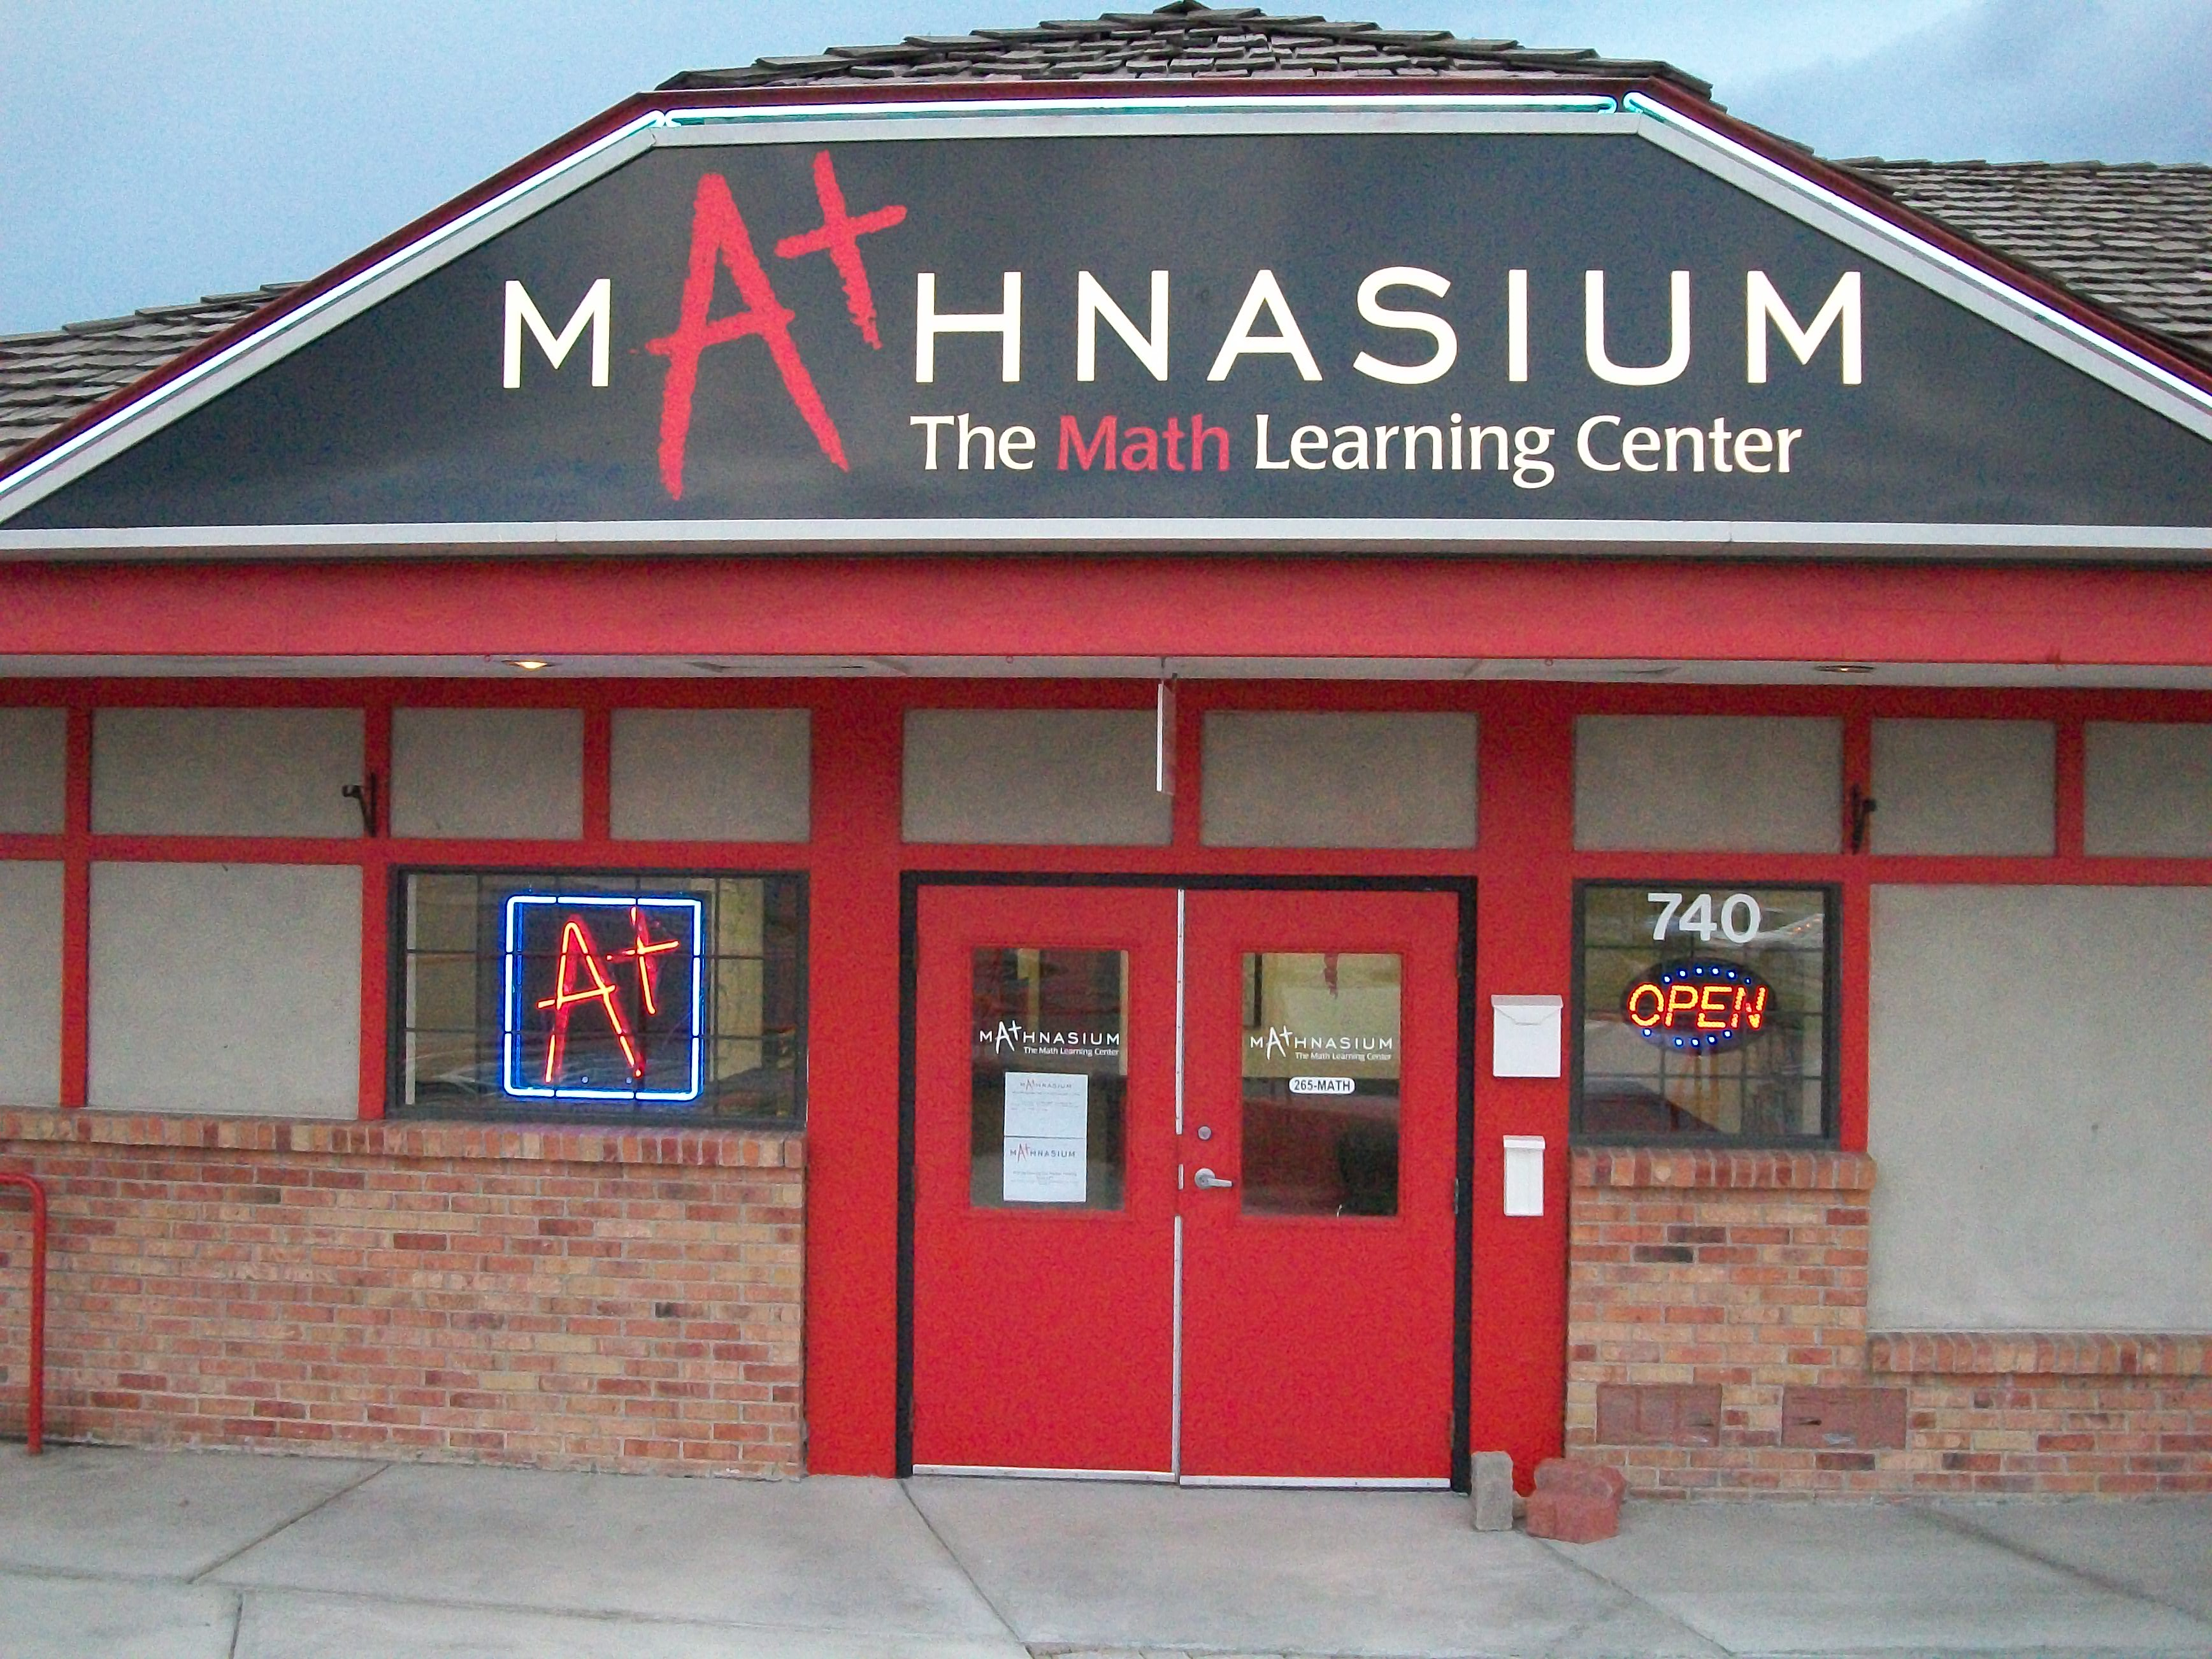 Mathnasium of Rockrimmon